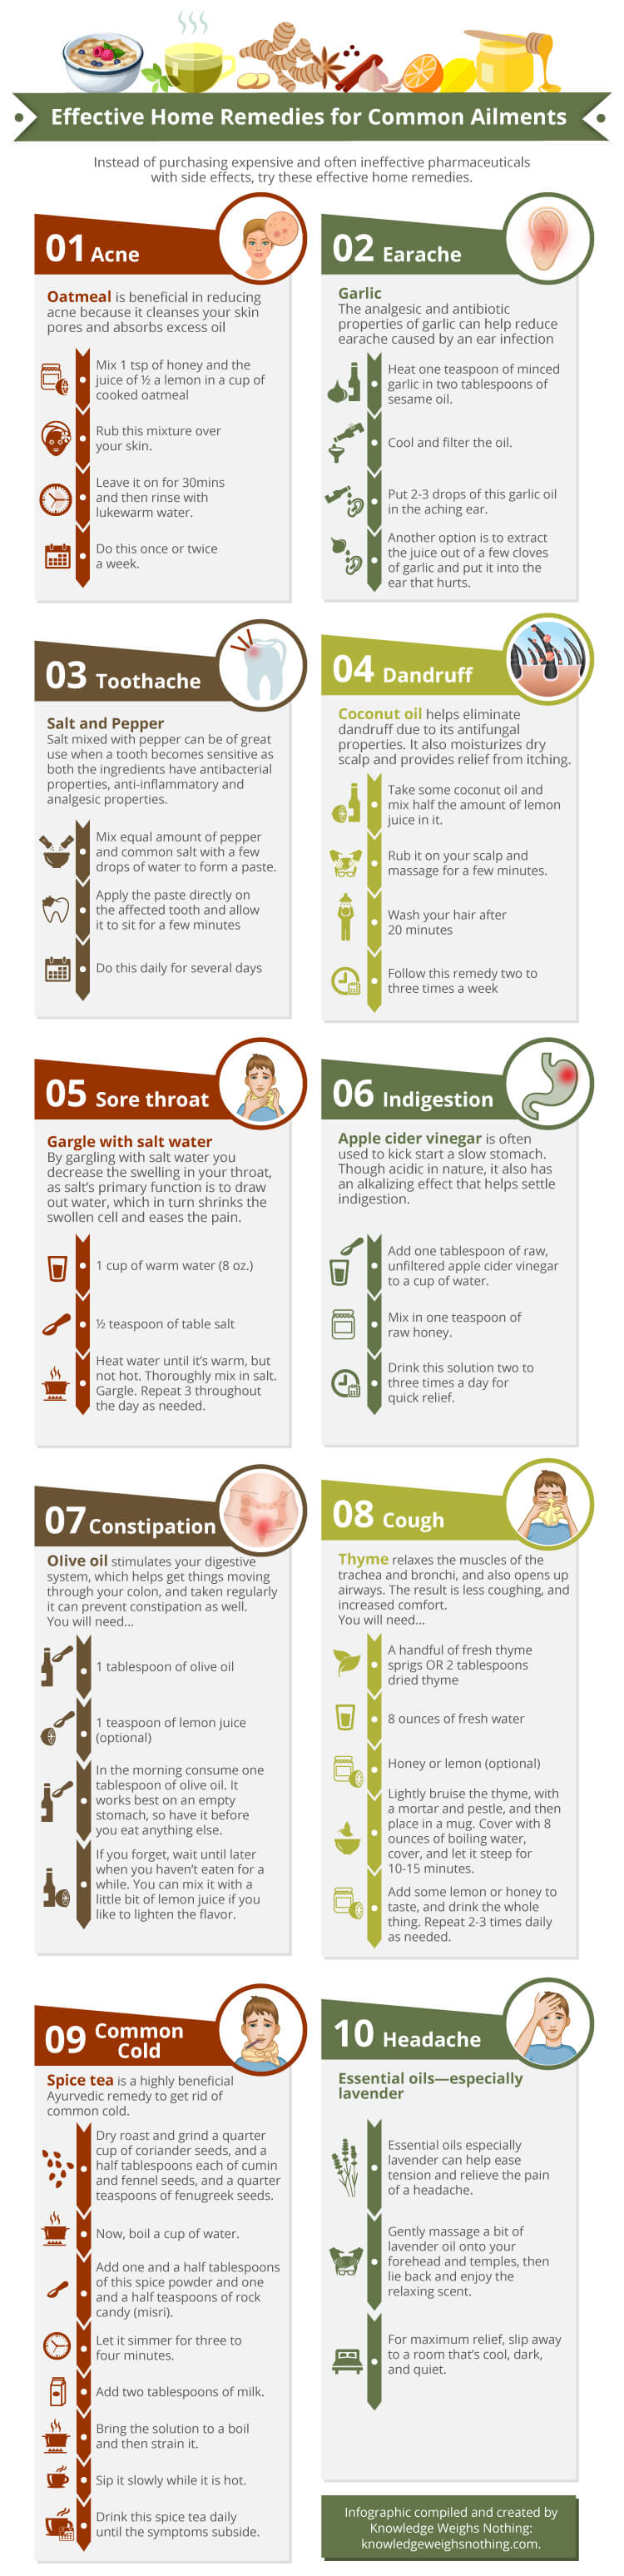 natural home remedics infographic